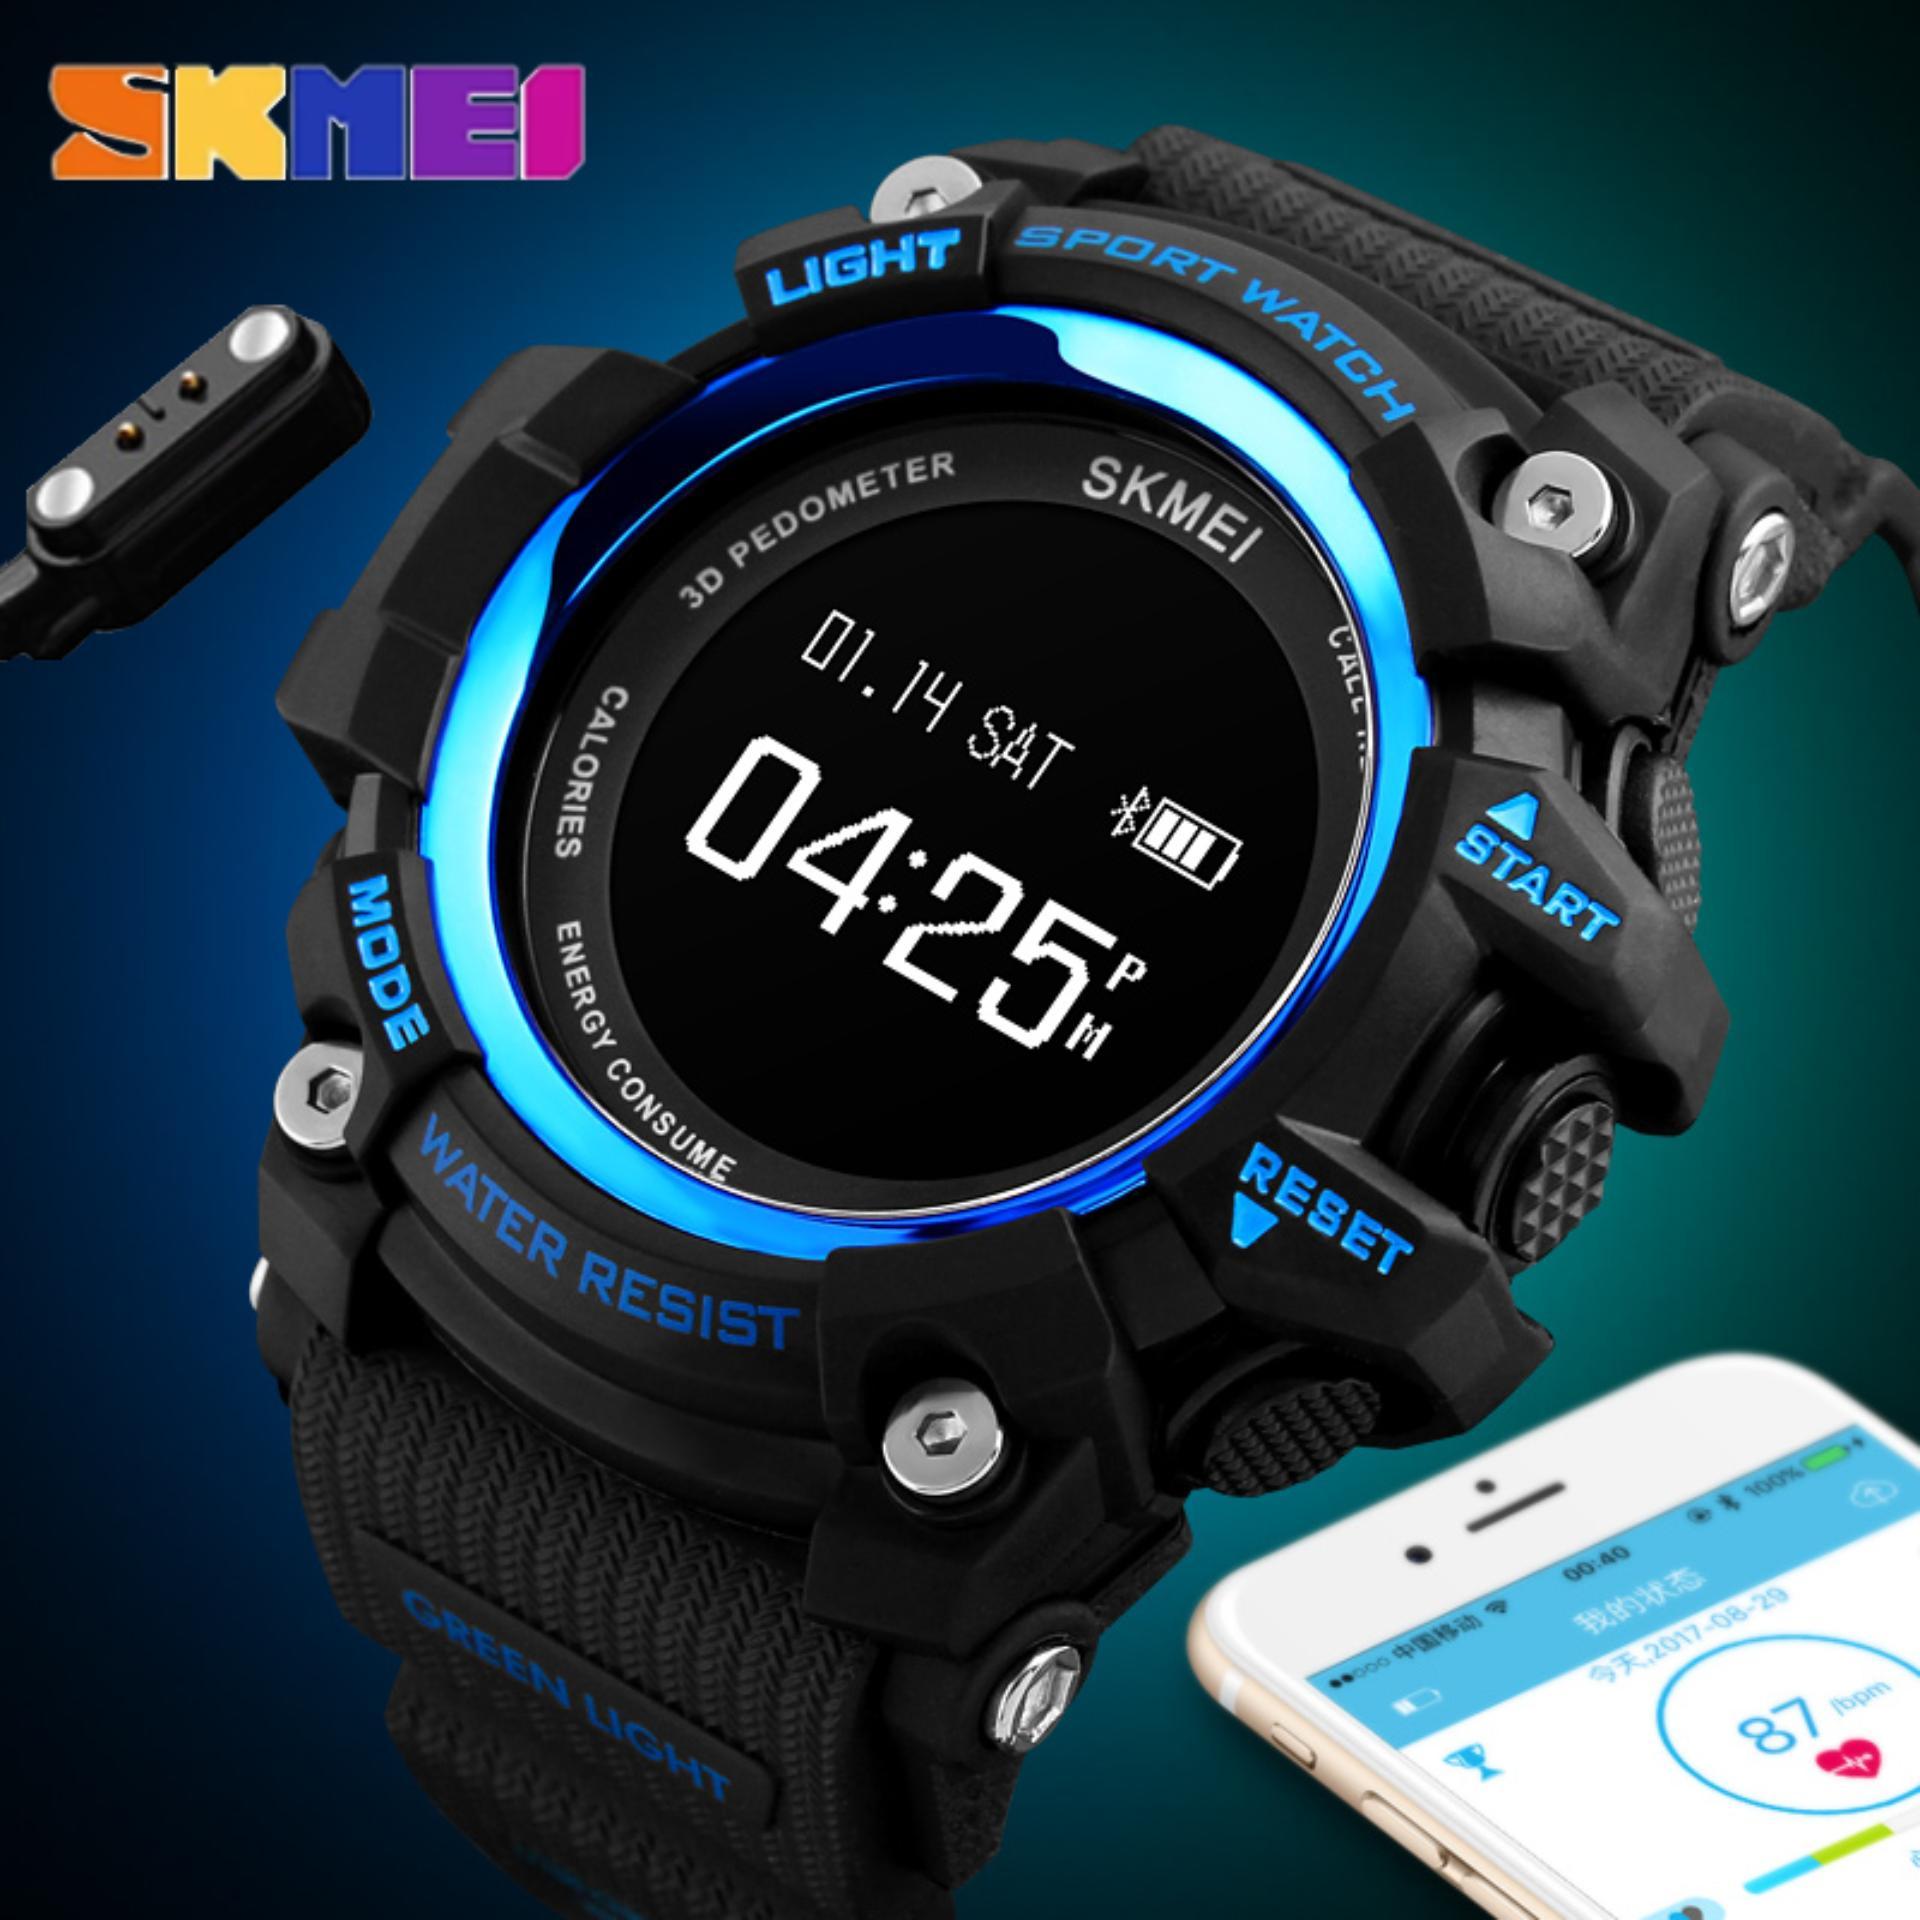 Skmei Pria Pintar Olahraga Jam Tangan Alat Pengukur Langkah Denyut Jantung Kalori Bluetooth Kamera Luar Ruangan Jam Tangan Multifungsi Tidur Monitor Anti-Air Jam Tangan 1188- internasional